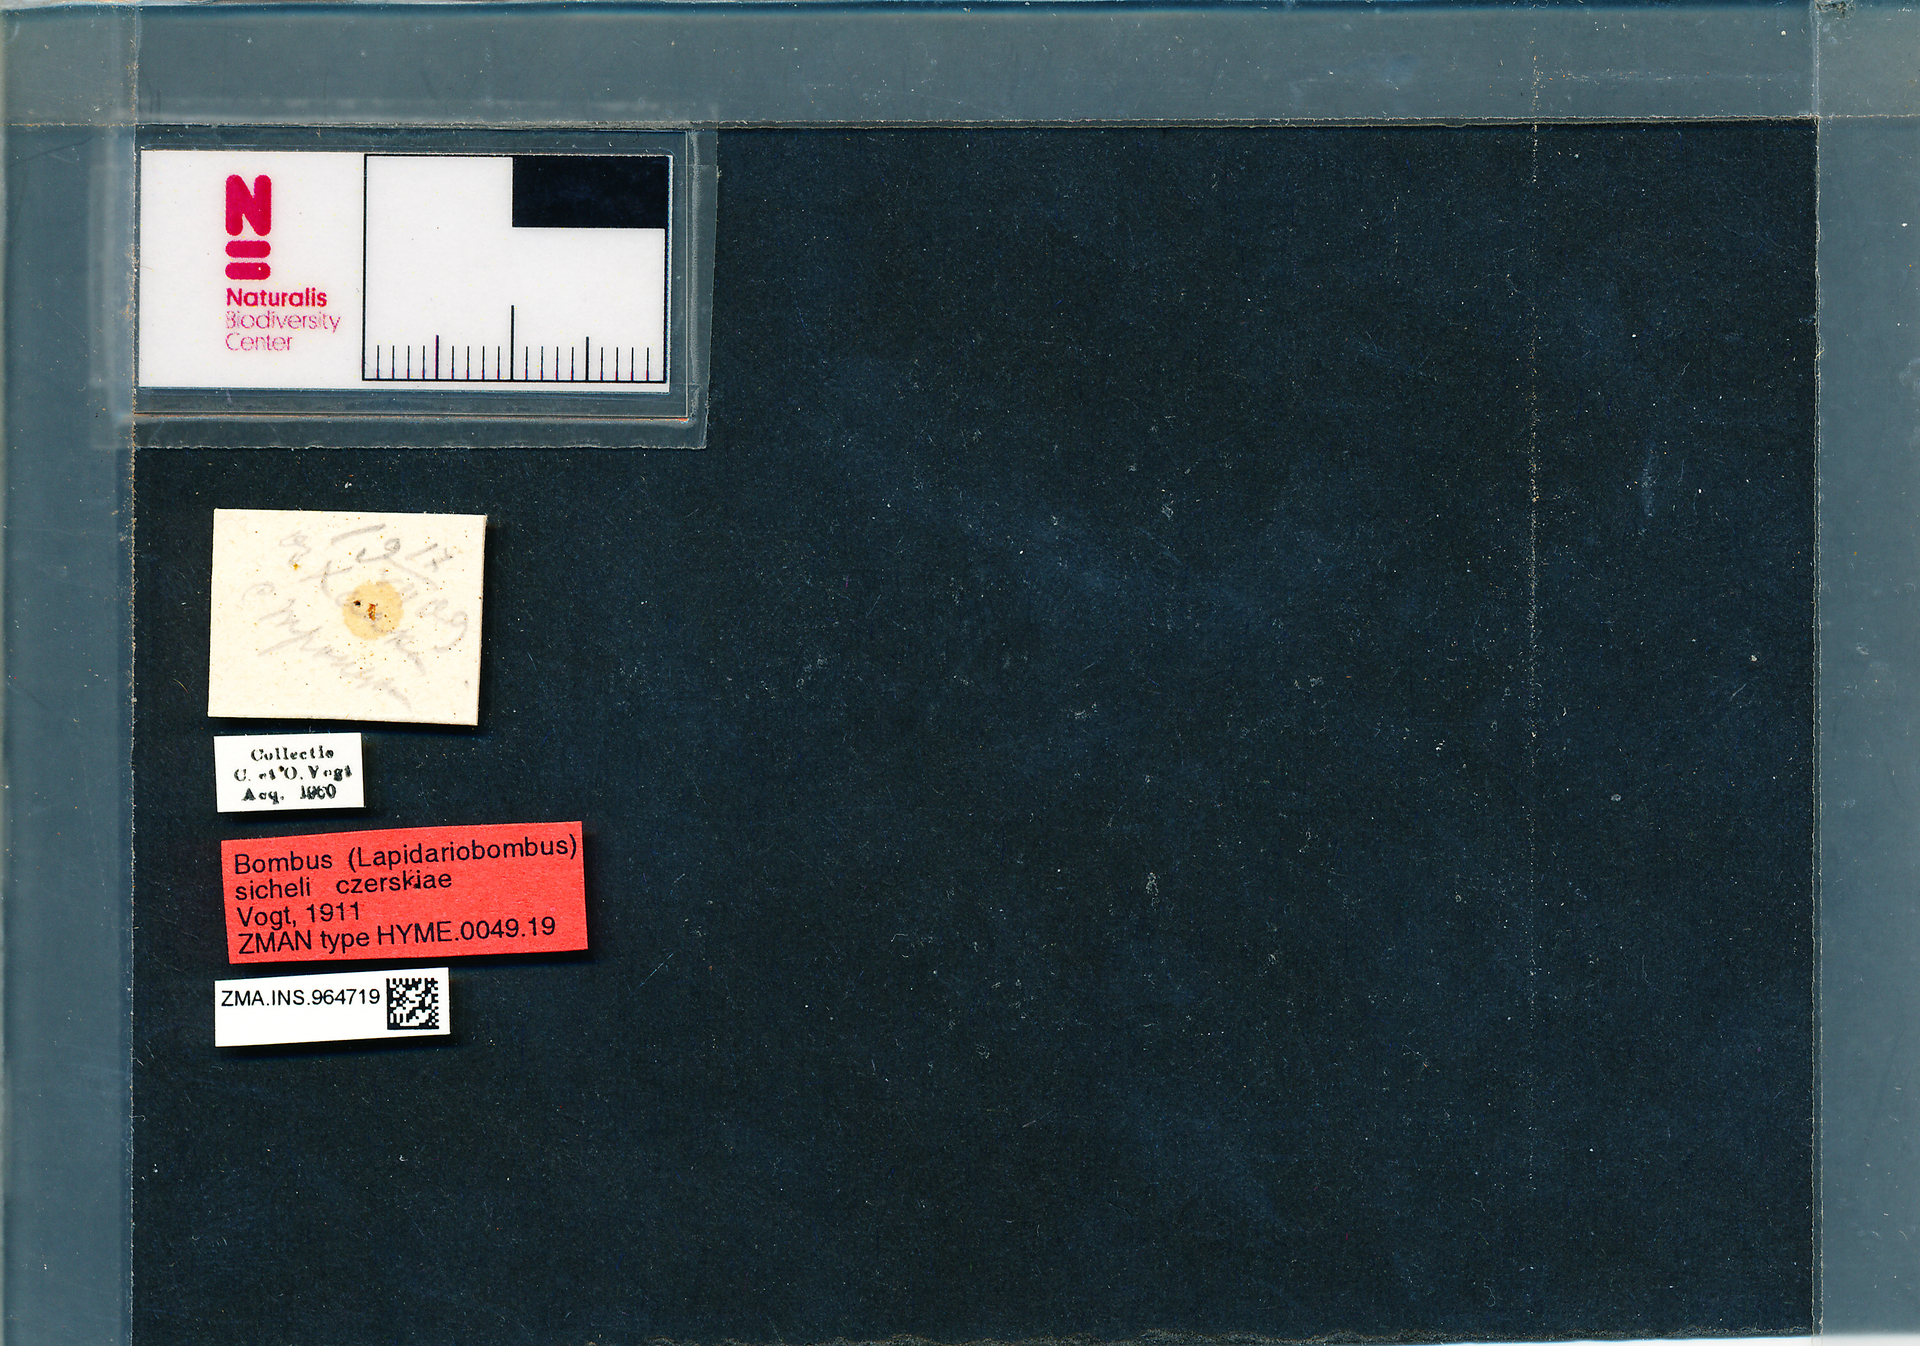 ZMA.INS.964719 | Bombus (Melanobombus) sichelii uniens Vogt, 1911